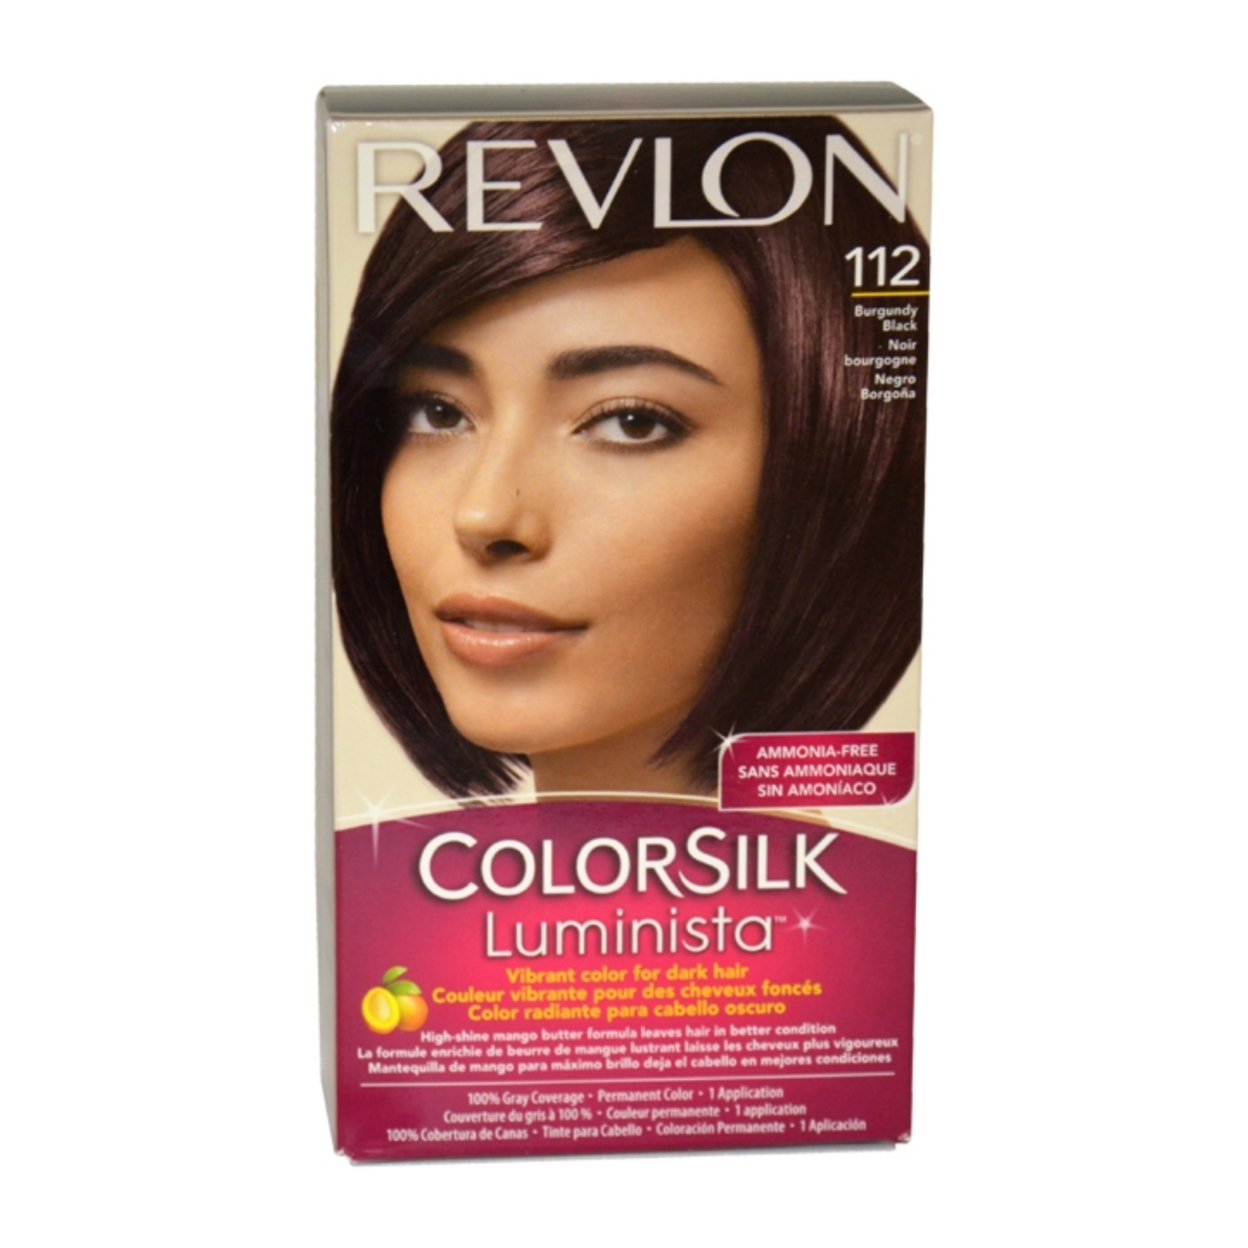 colorsilk Luminista #112 Burgundy Black by Revlon for Women - 1 Application Hair Color 58653c97e2246122da1bbdda